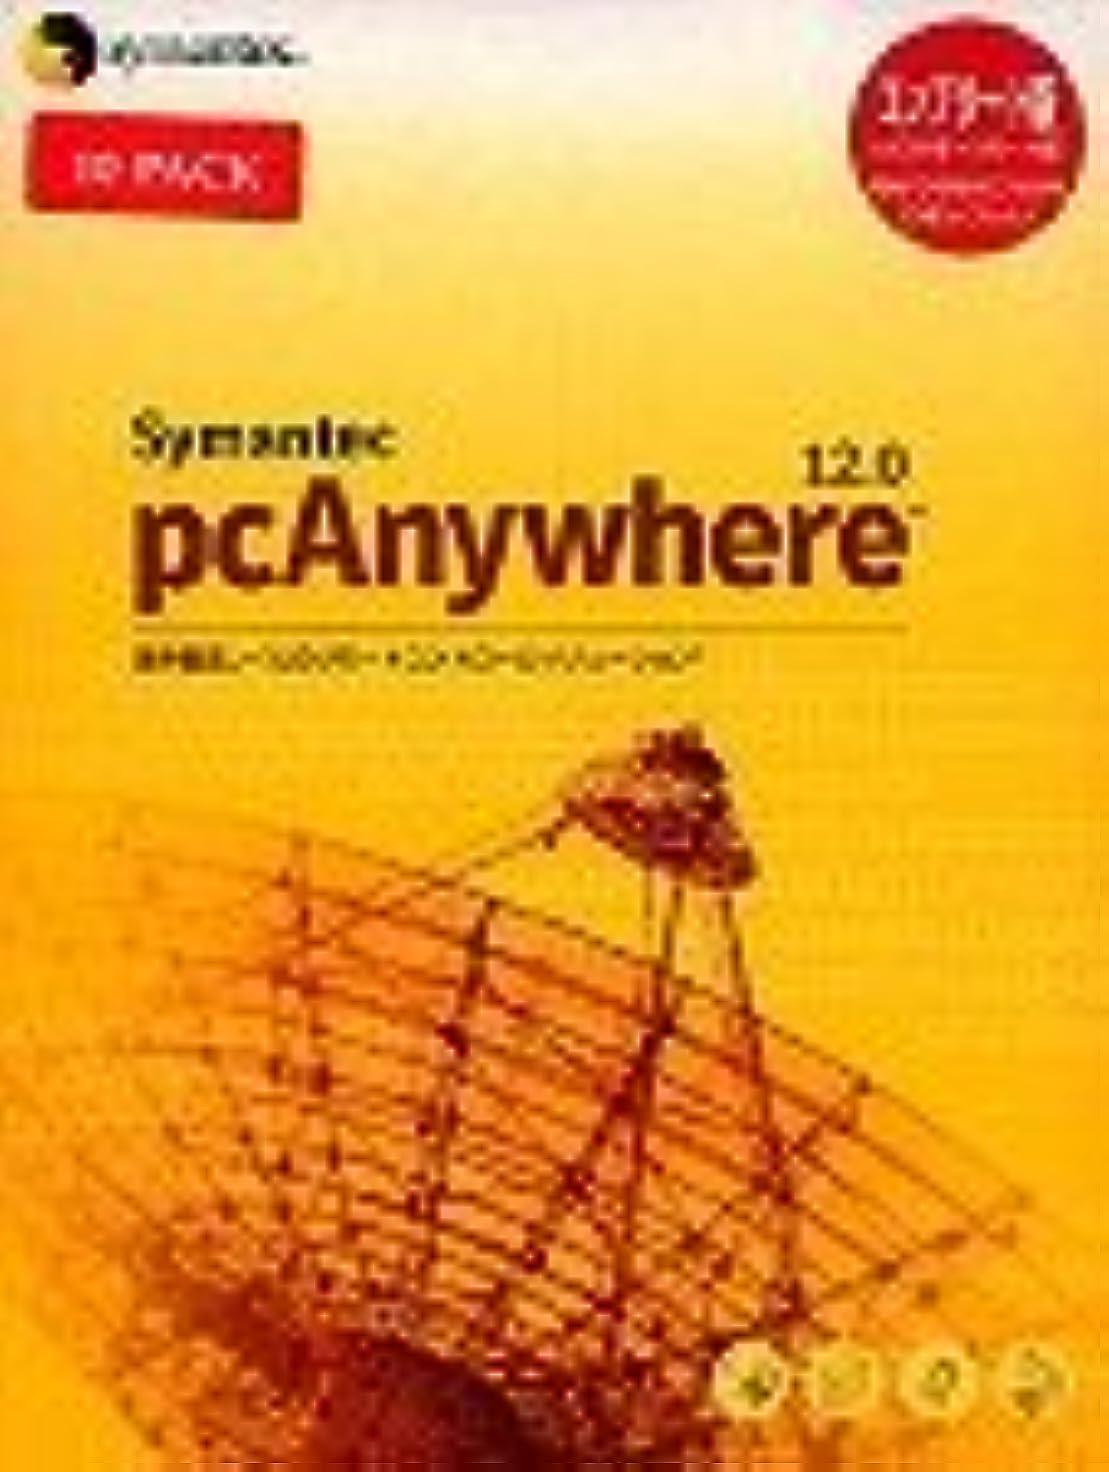 【旧商品】Symantec pcAnywhere 12.0J Complete 10pack版